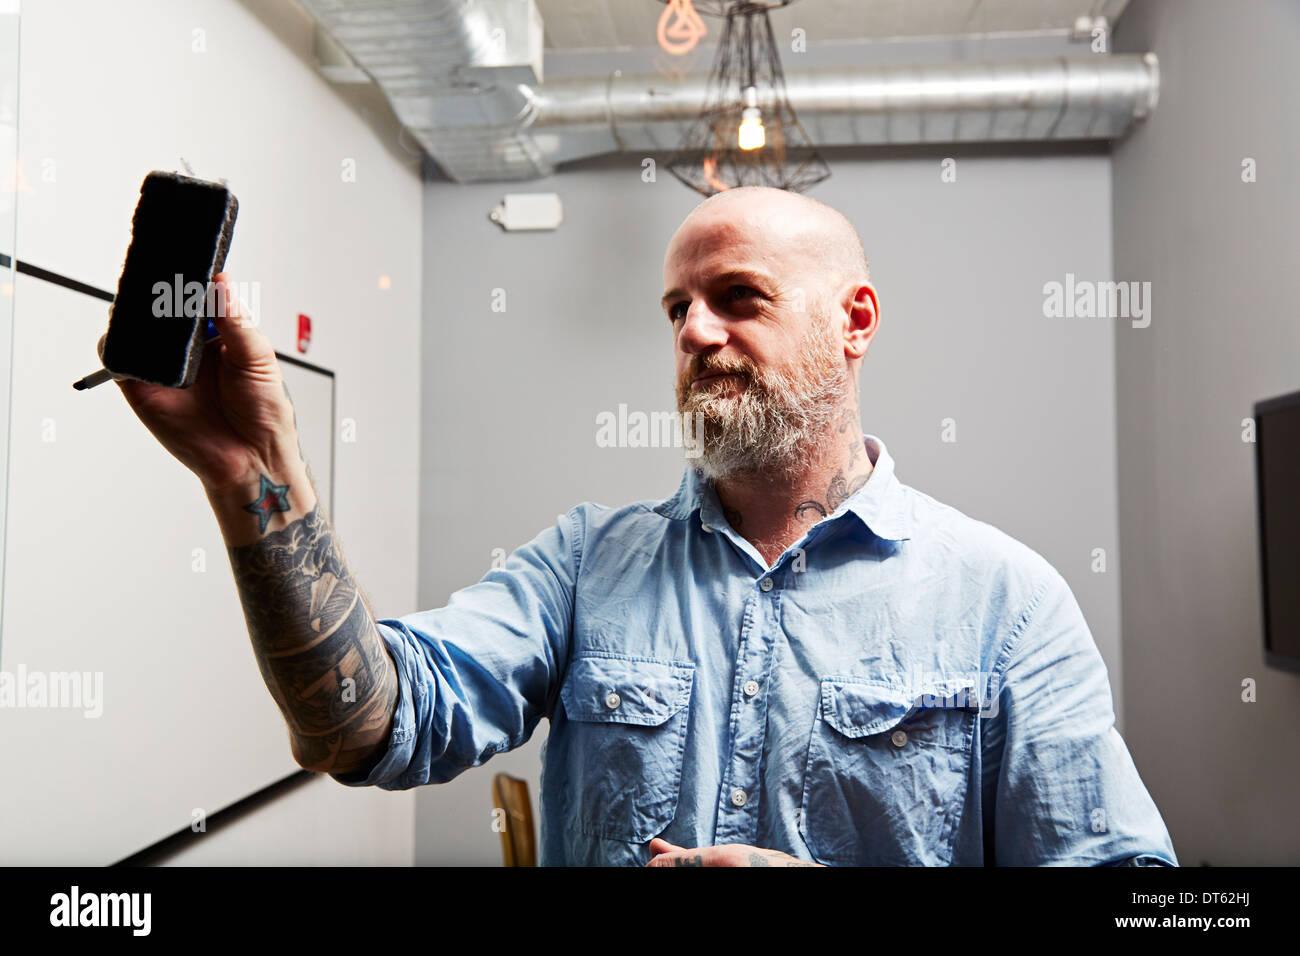 Uomo maturo mediante whiteboard eraser Foto Stock